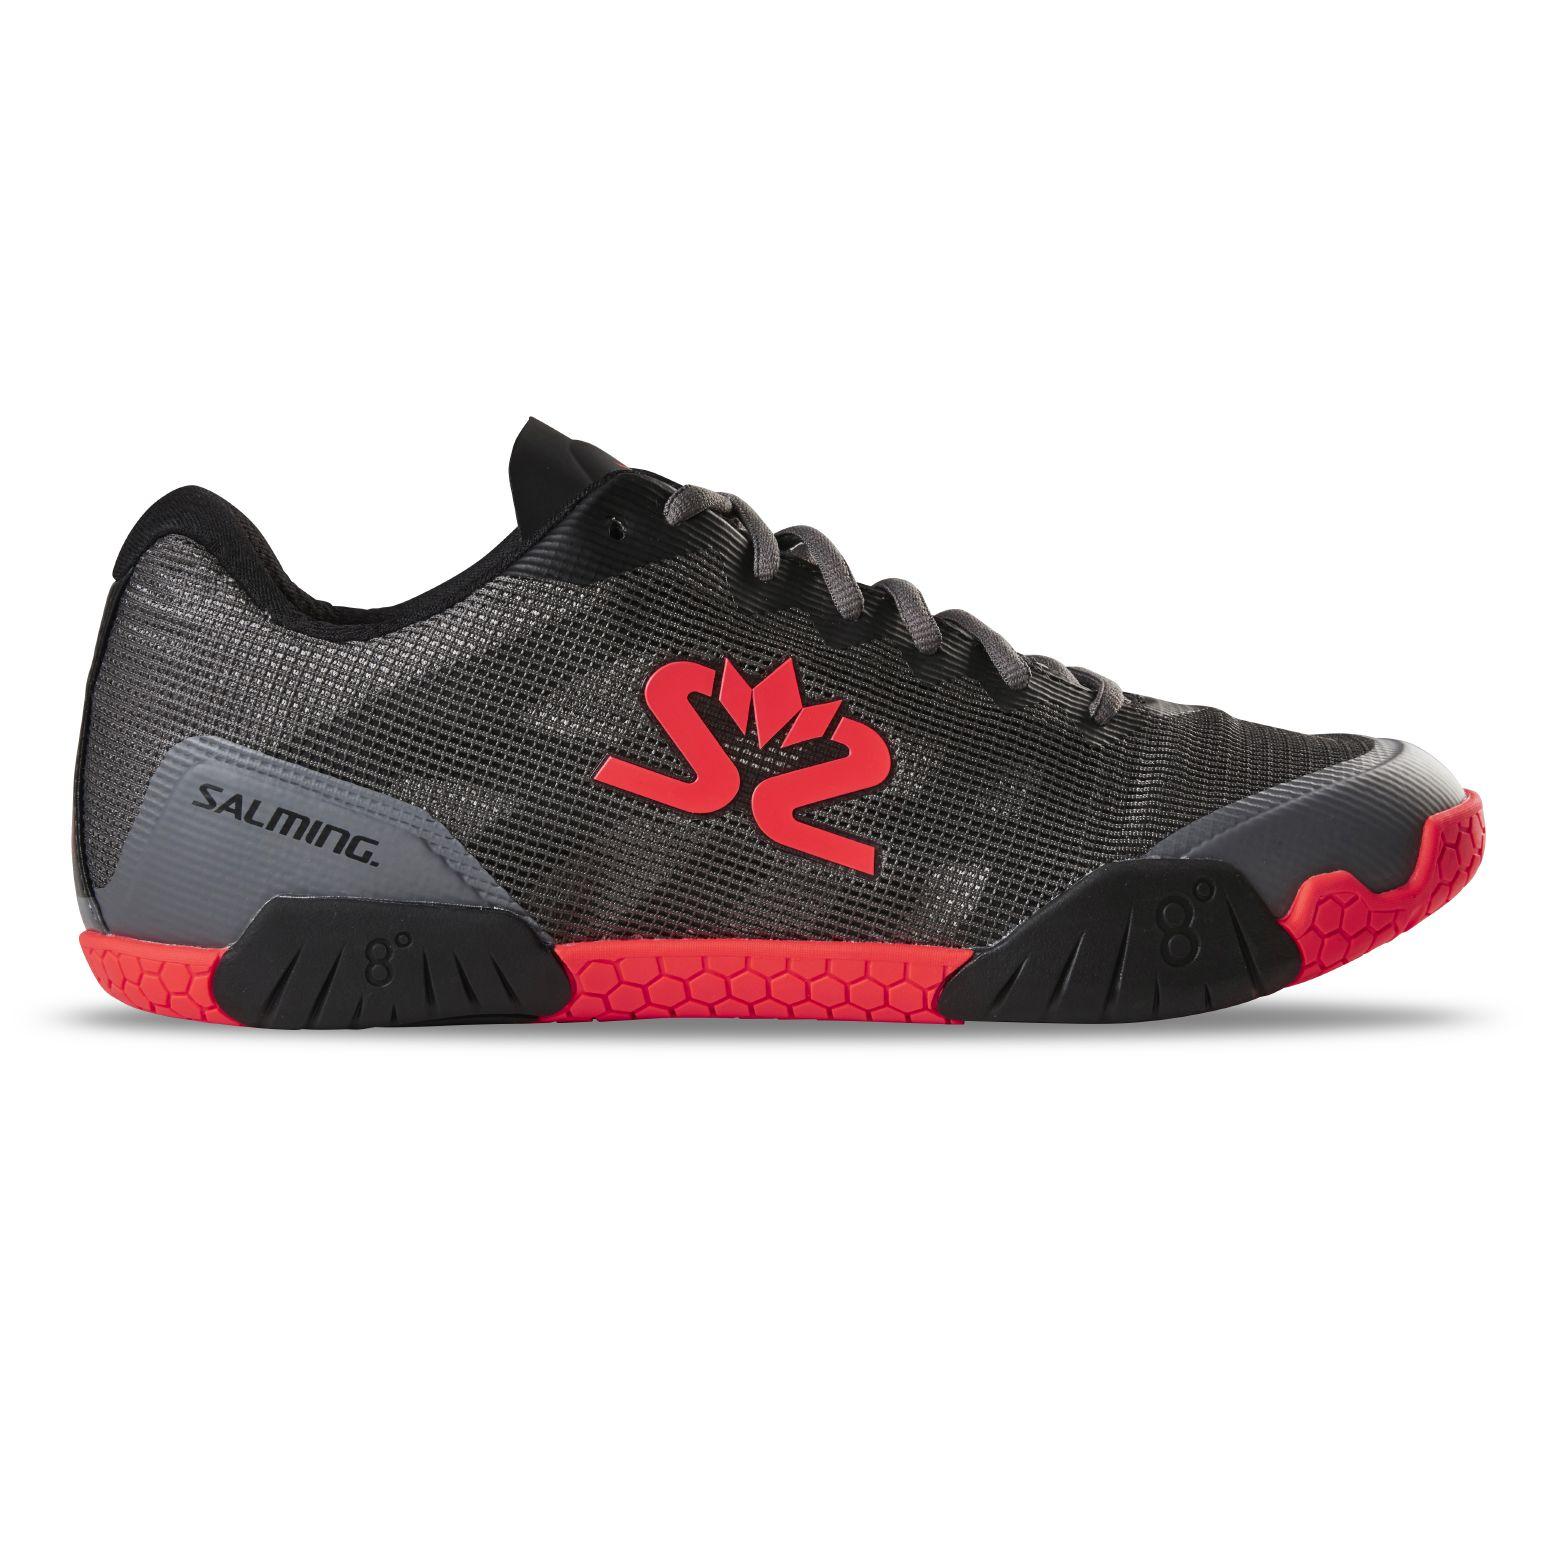 Salming Hawk Shoe Men GunMetal/Red 13 UK - 49 1/3 EUR - 32 cm